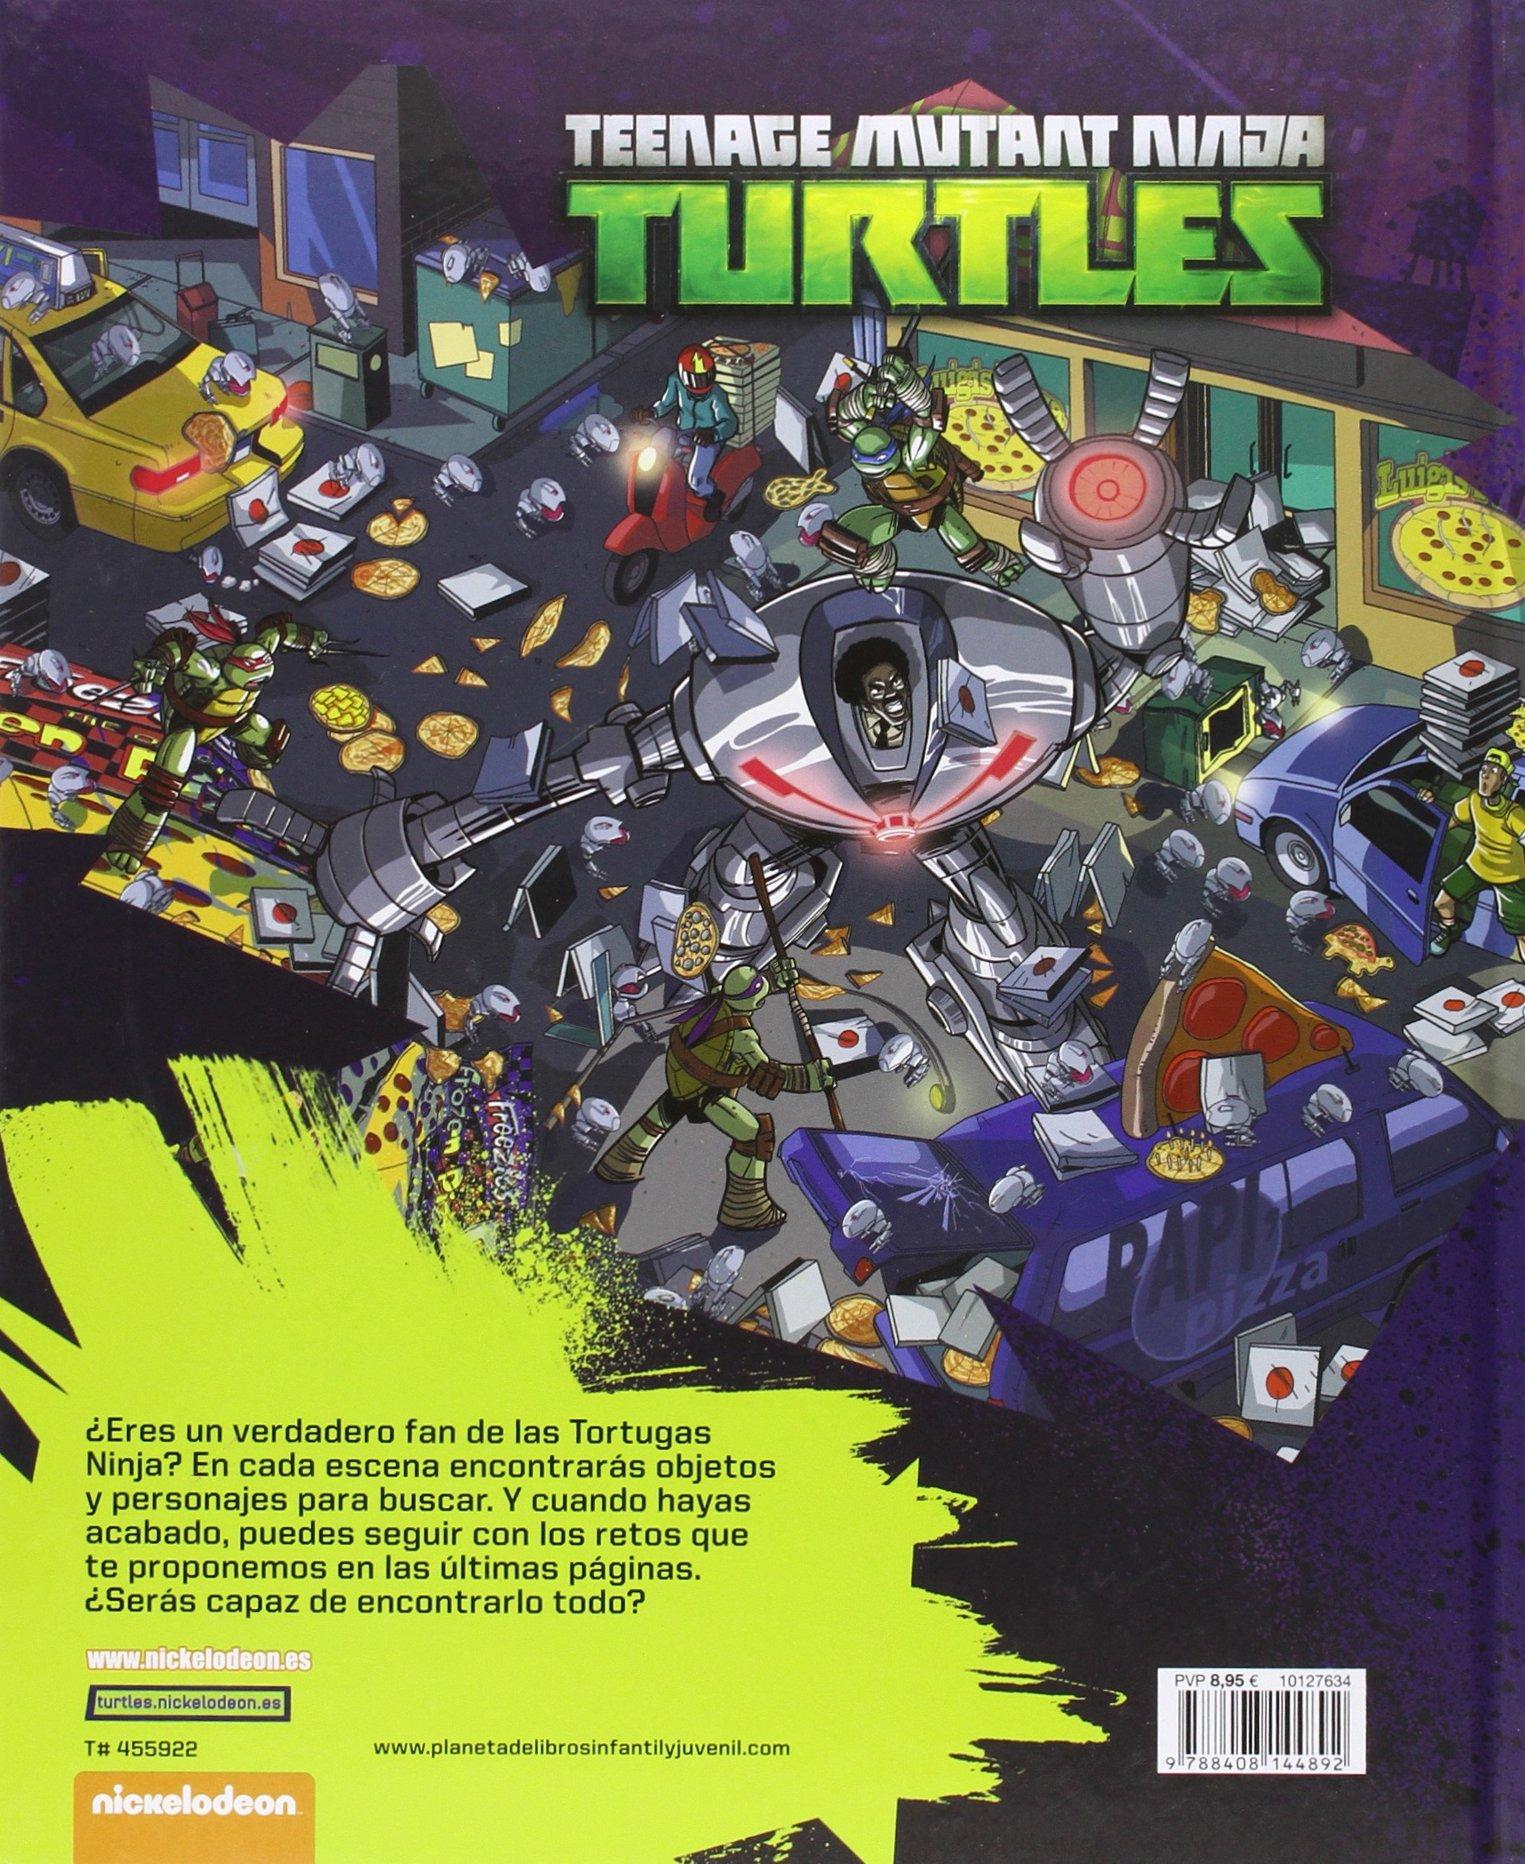 Las Tortugas Ninja. ¿Dónde está?: VV.AA.: 9788408144892 ...